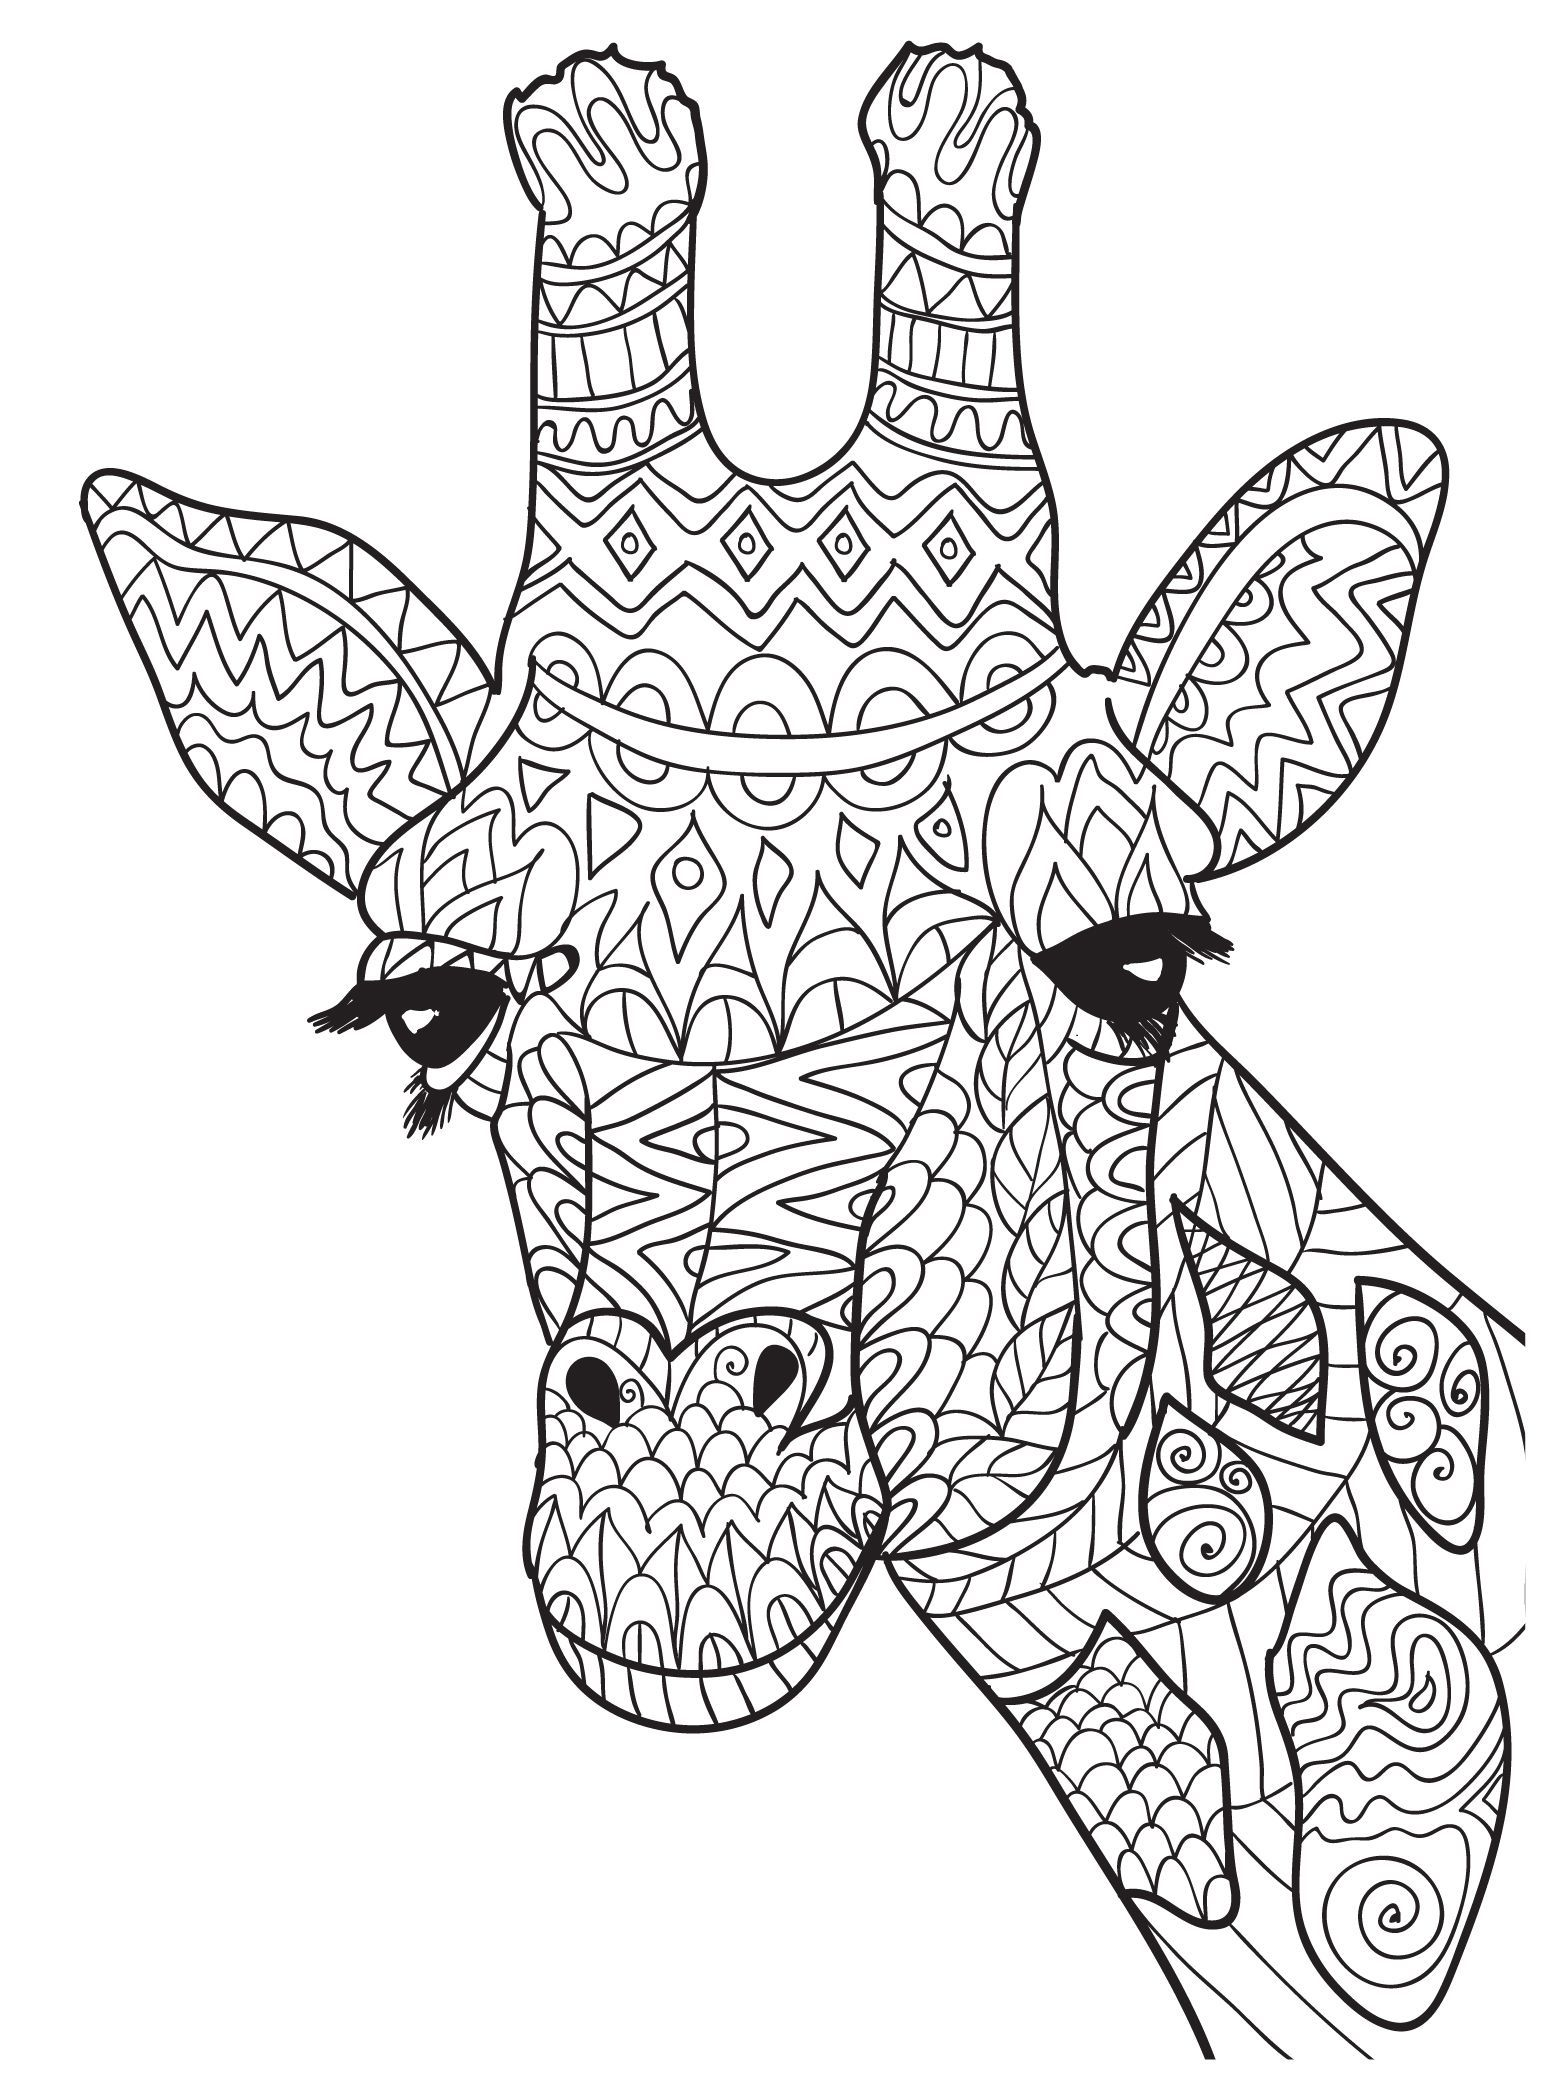 Zentangle Giraffe Head Coloring Picture Giraffe Coloring Pages Animal Coloring Pages Giraffe Colors